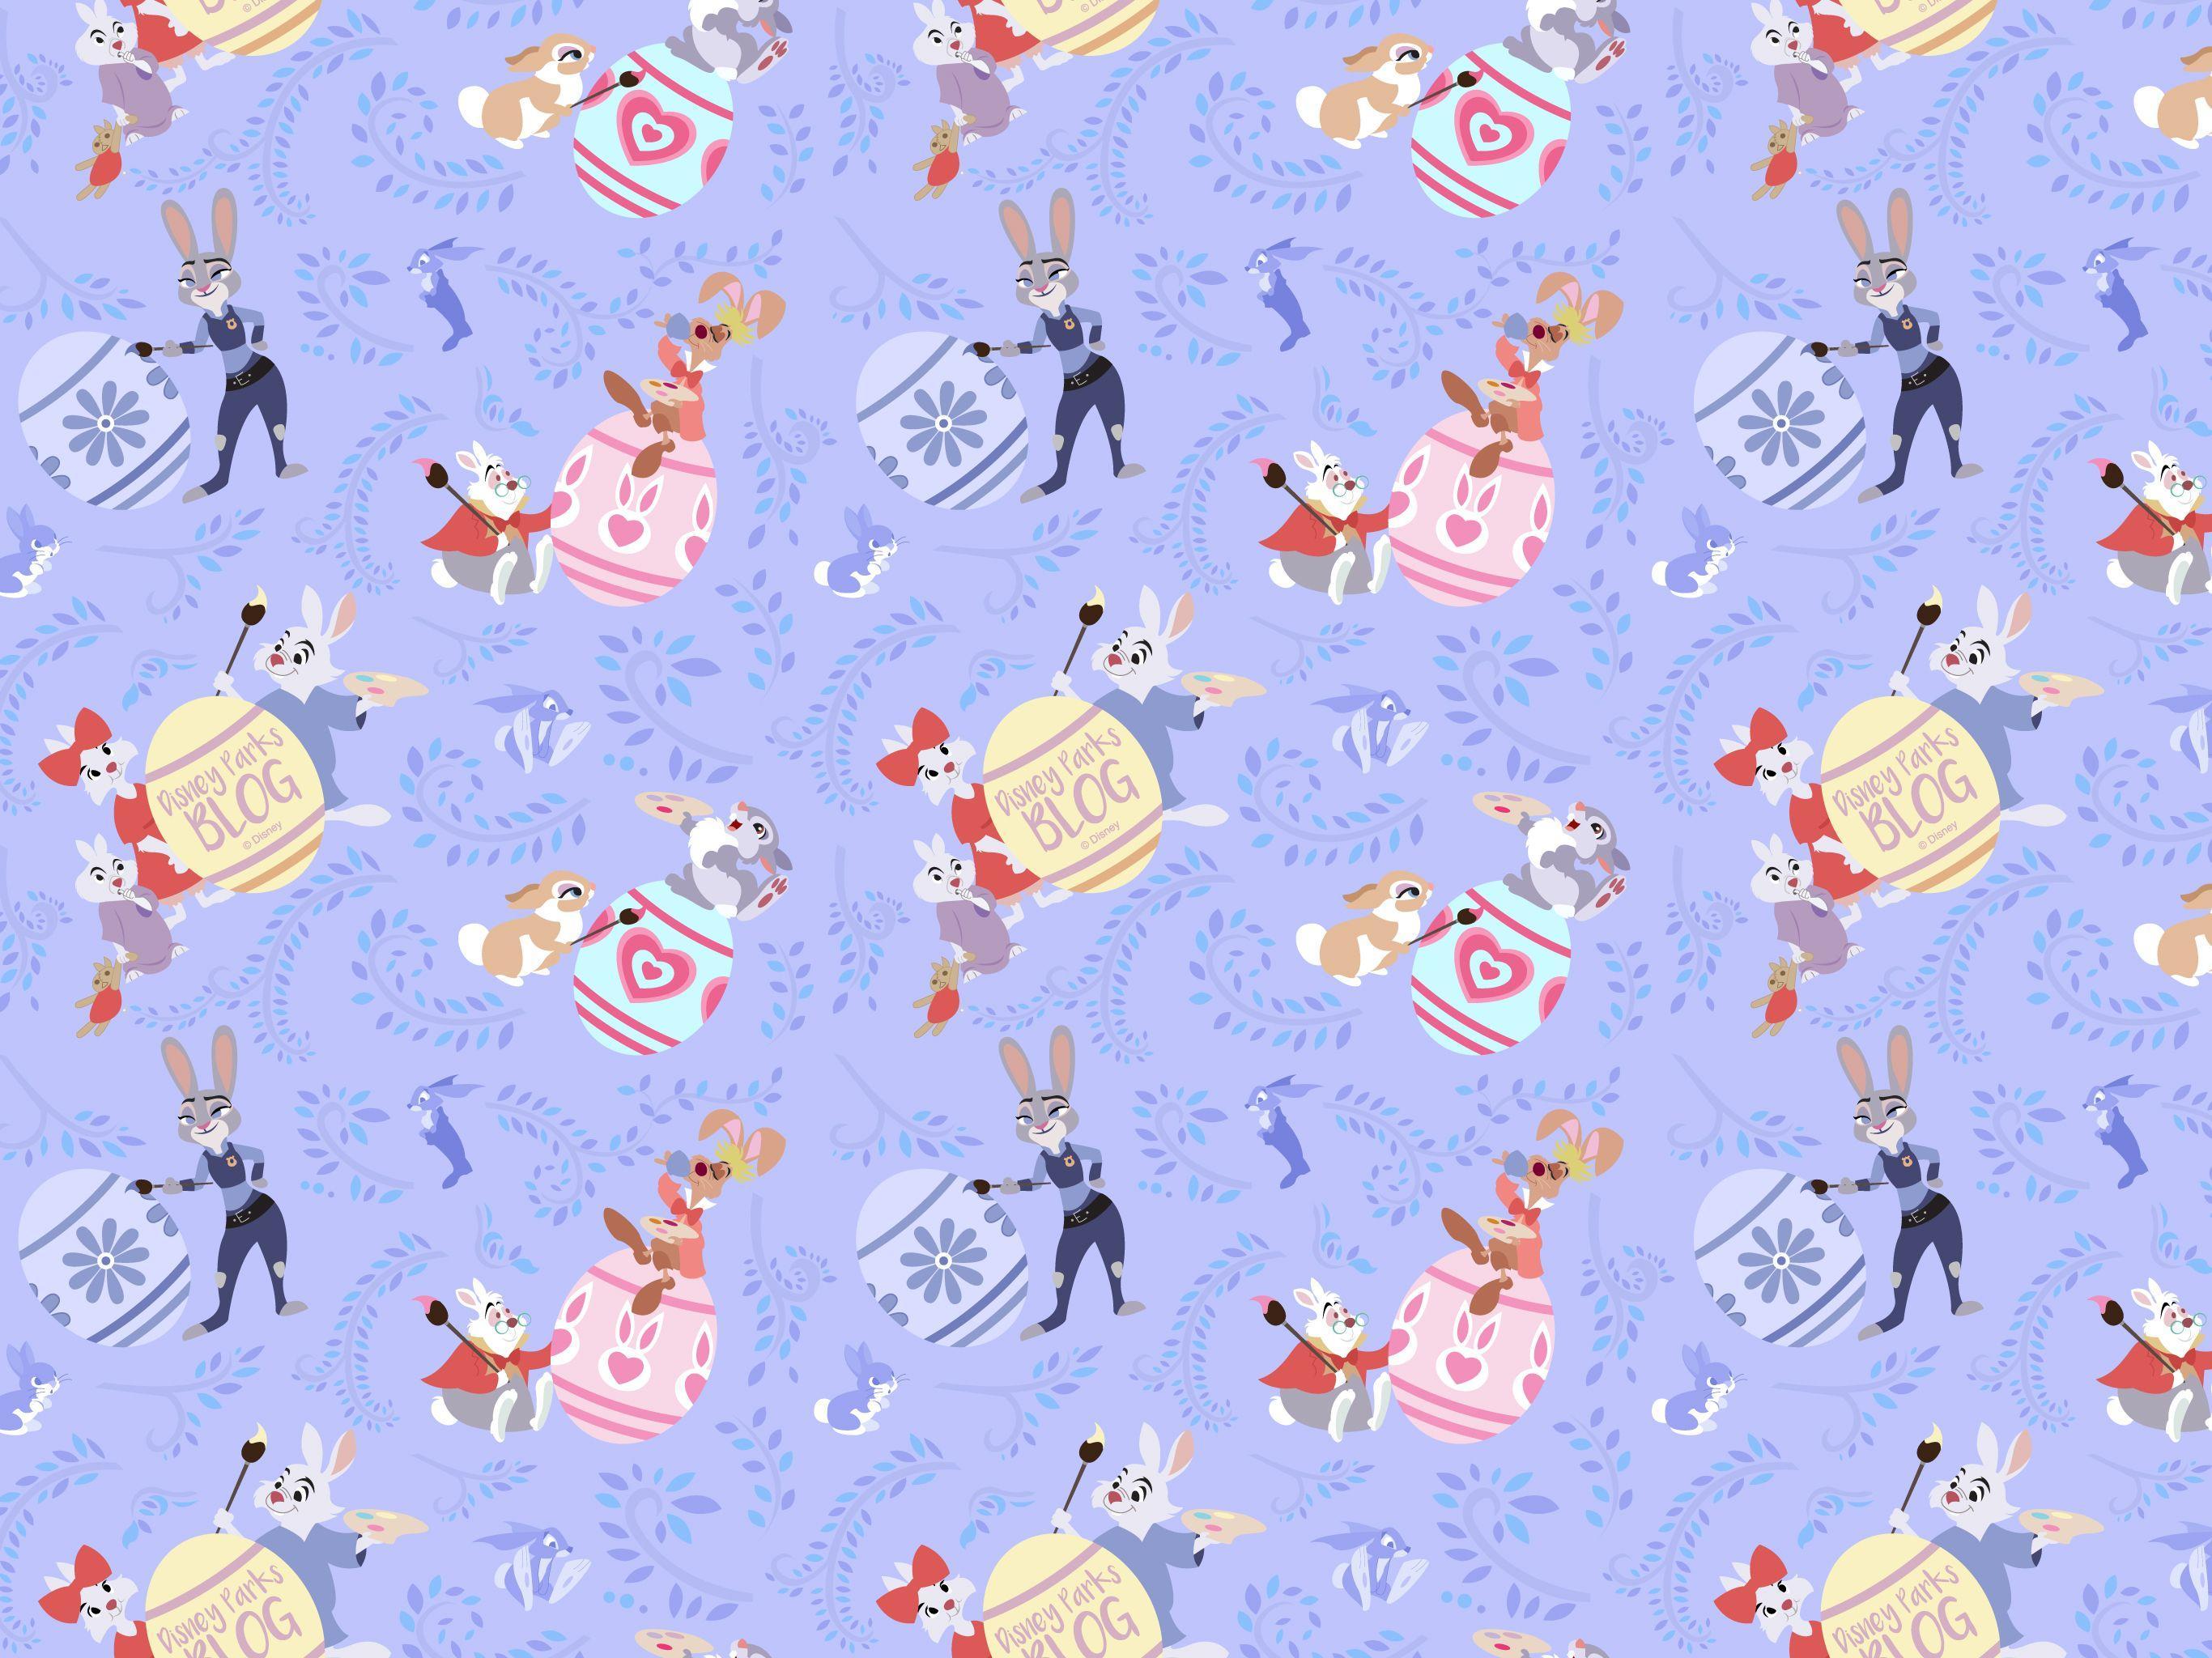 Disney iPad Wallpapers - Top Free